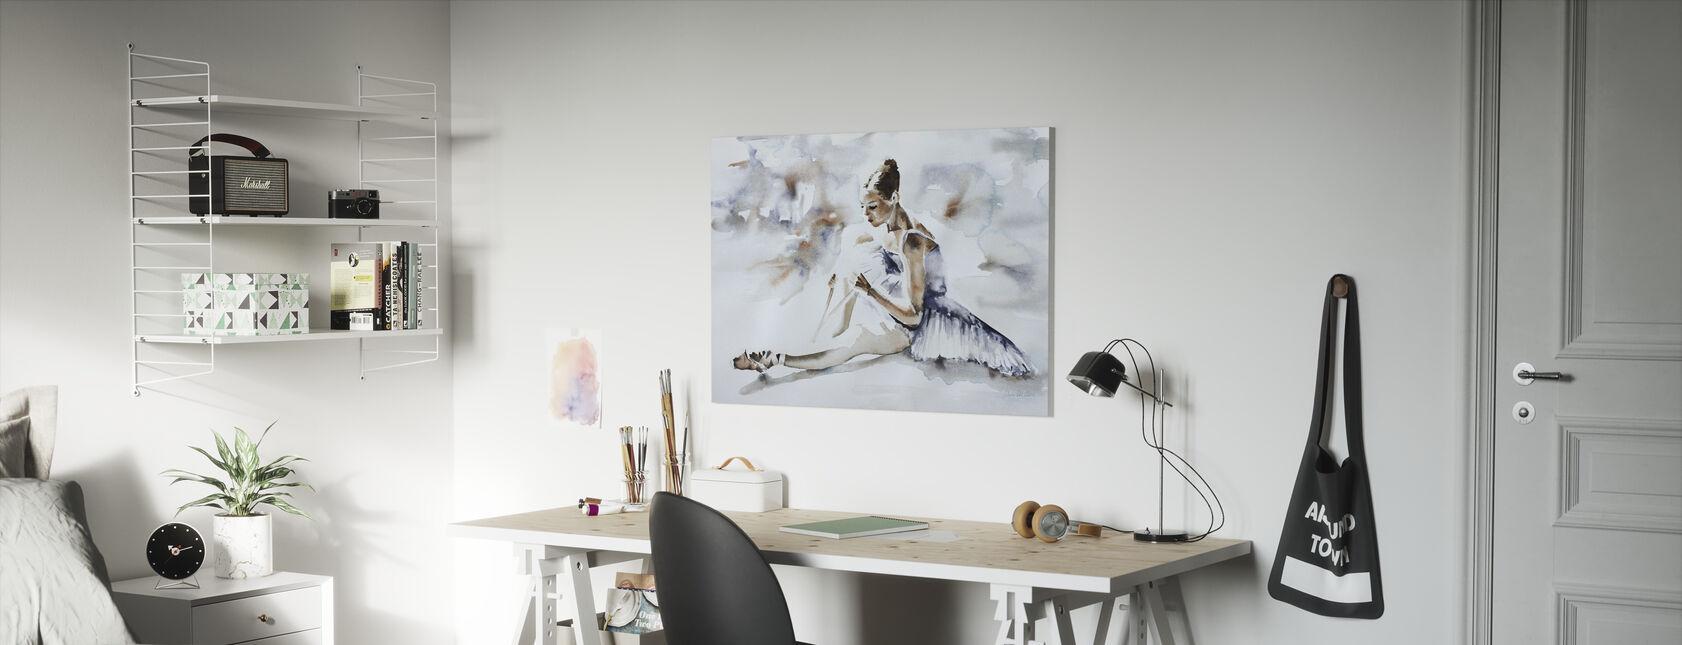 Jurk repetitie - Canvas print - Kinderkamer